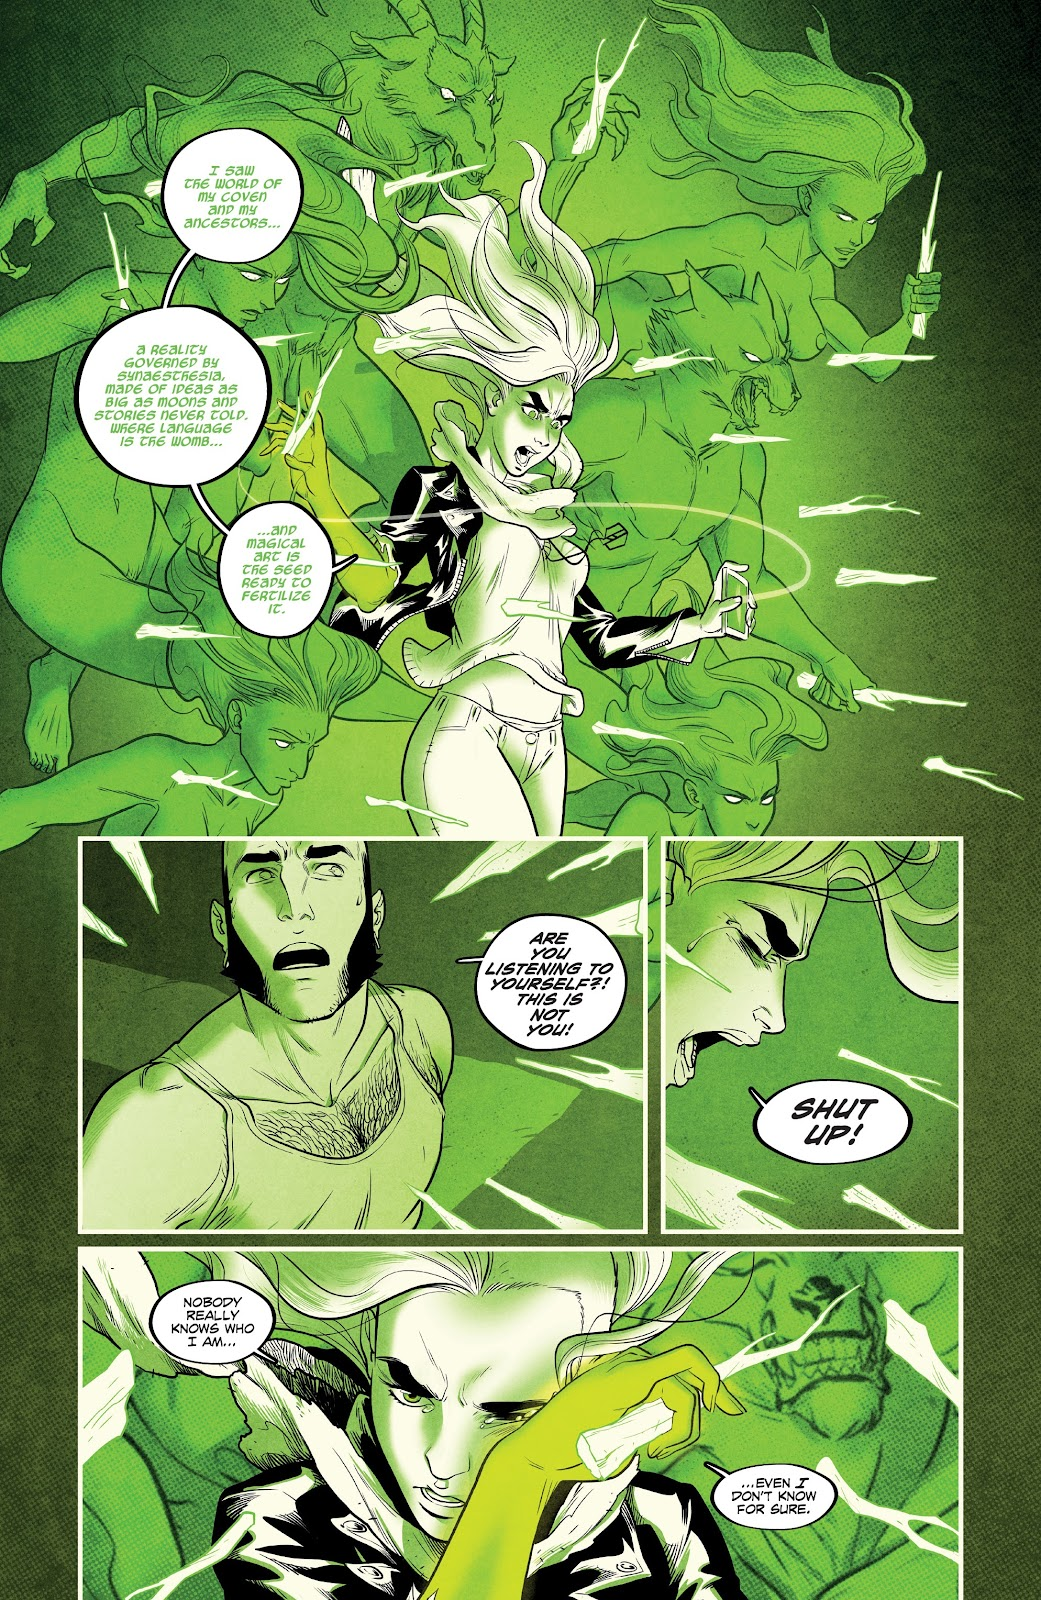 Read online Nomen Omen comic -  Issue #6 - 13